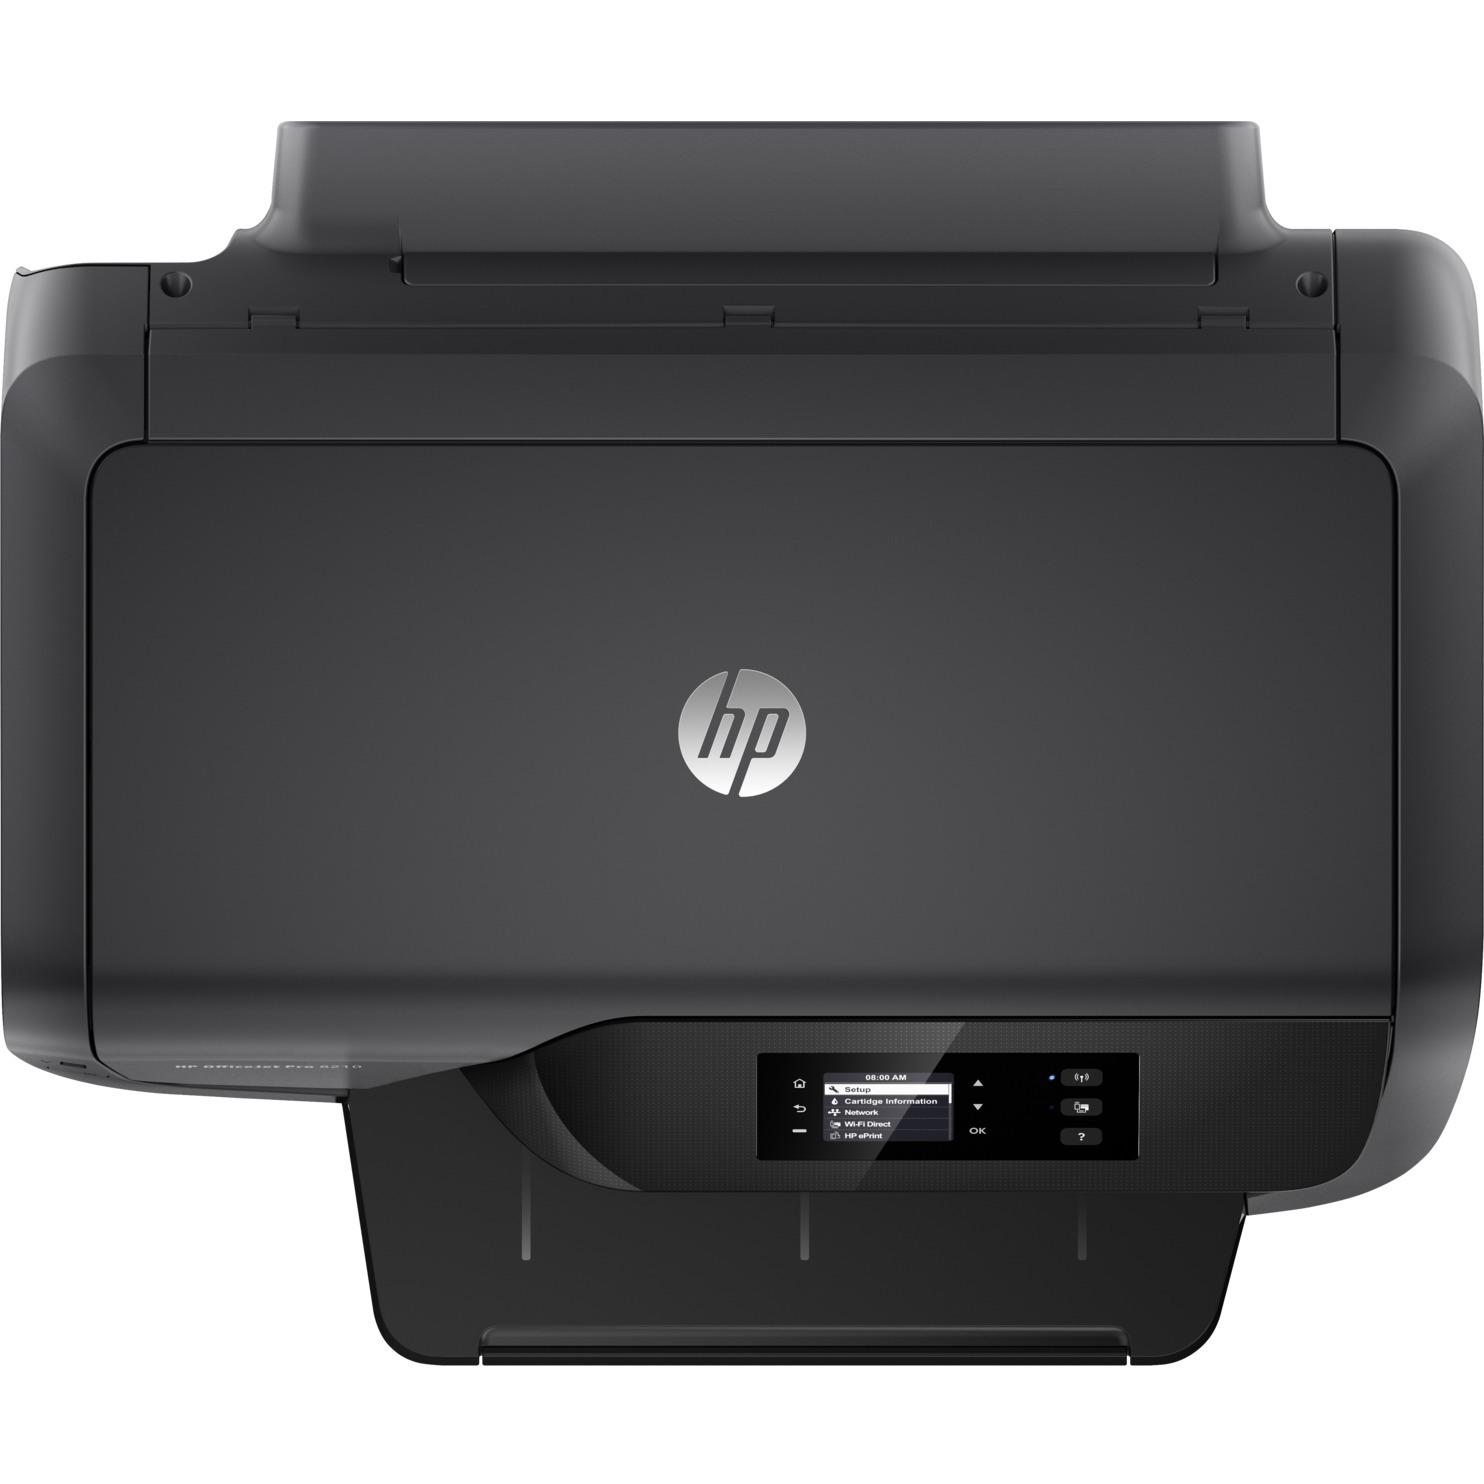 hp officejet pro 8210 inkjet printer monochrome 2400 x 1200 dpi print plain paper print. Black Bedroom Furniture Sets. Home Design Ideas